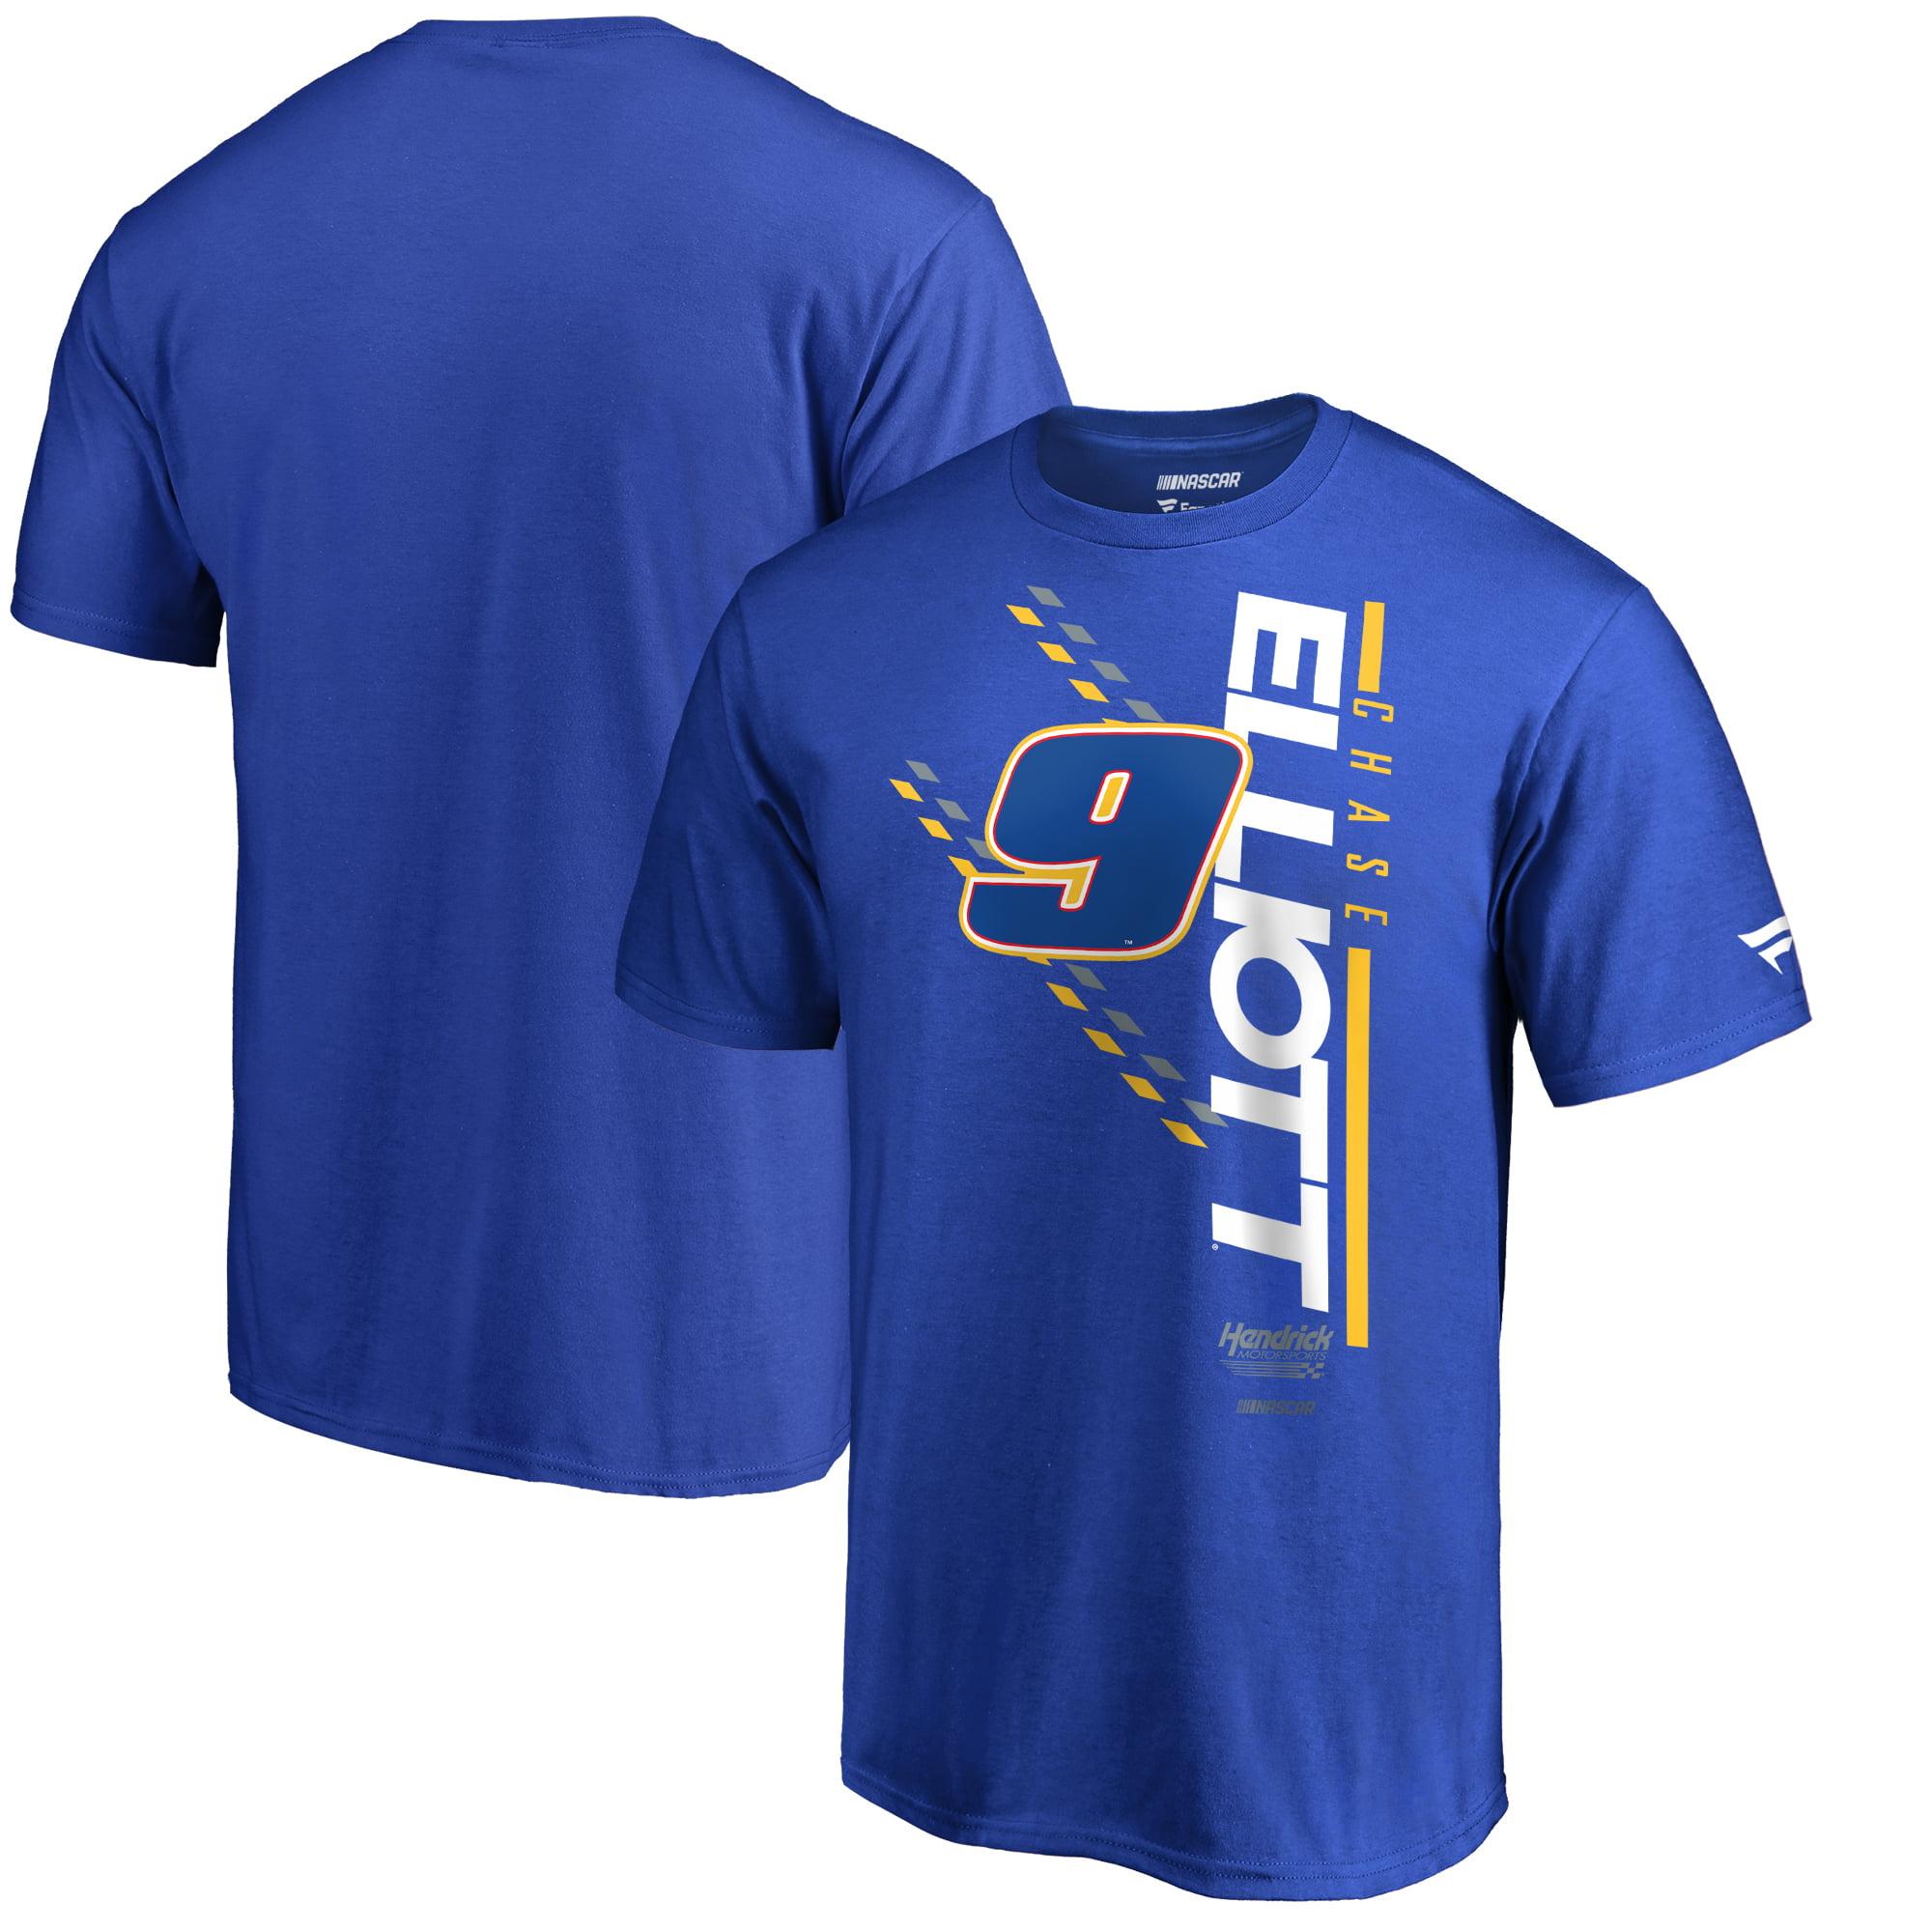 Chase Elliott Fanatics Branded NASCAR Track Bar T-Shirt - Royal